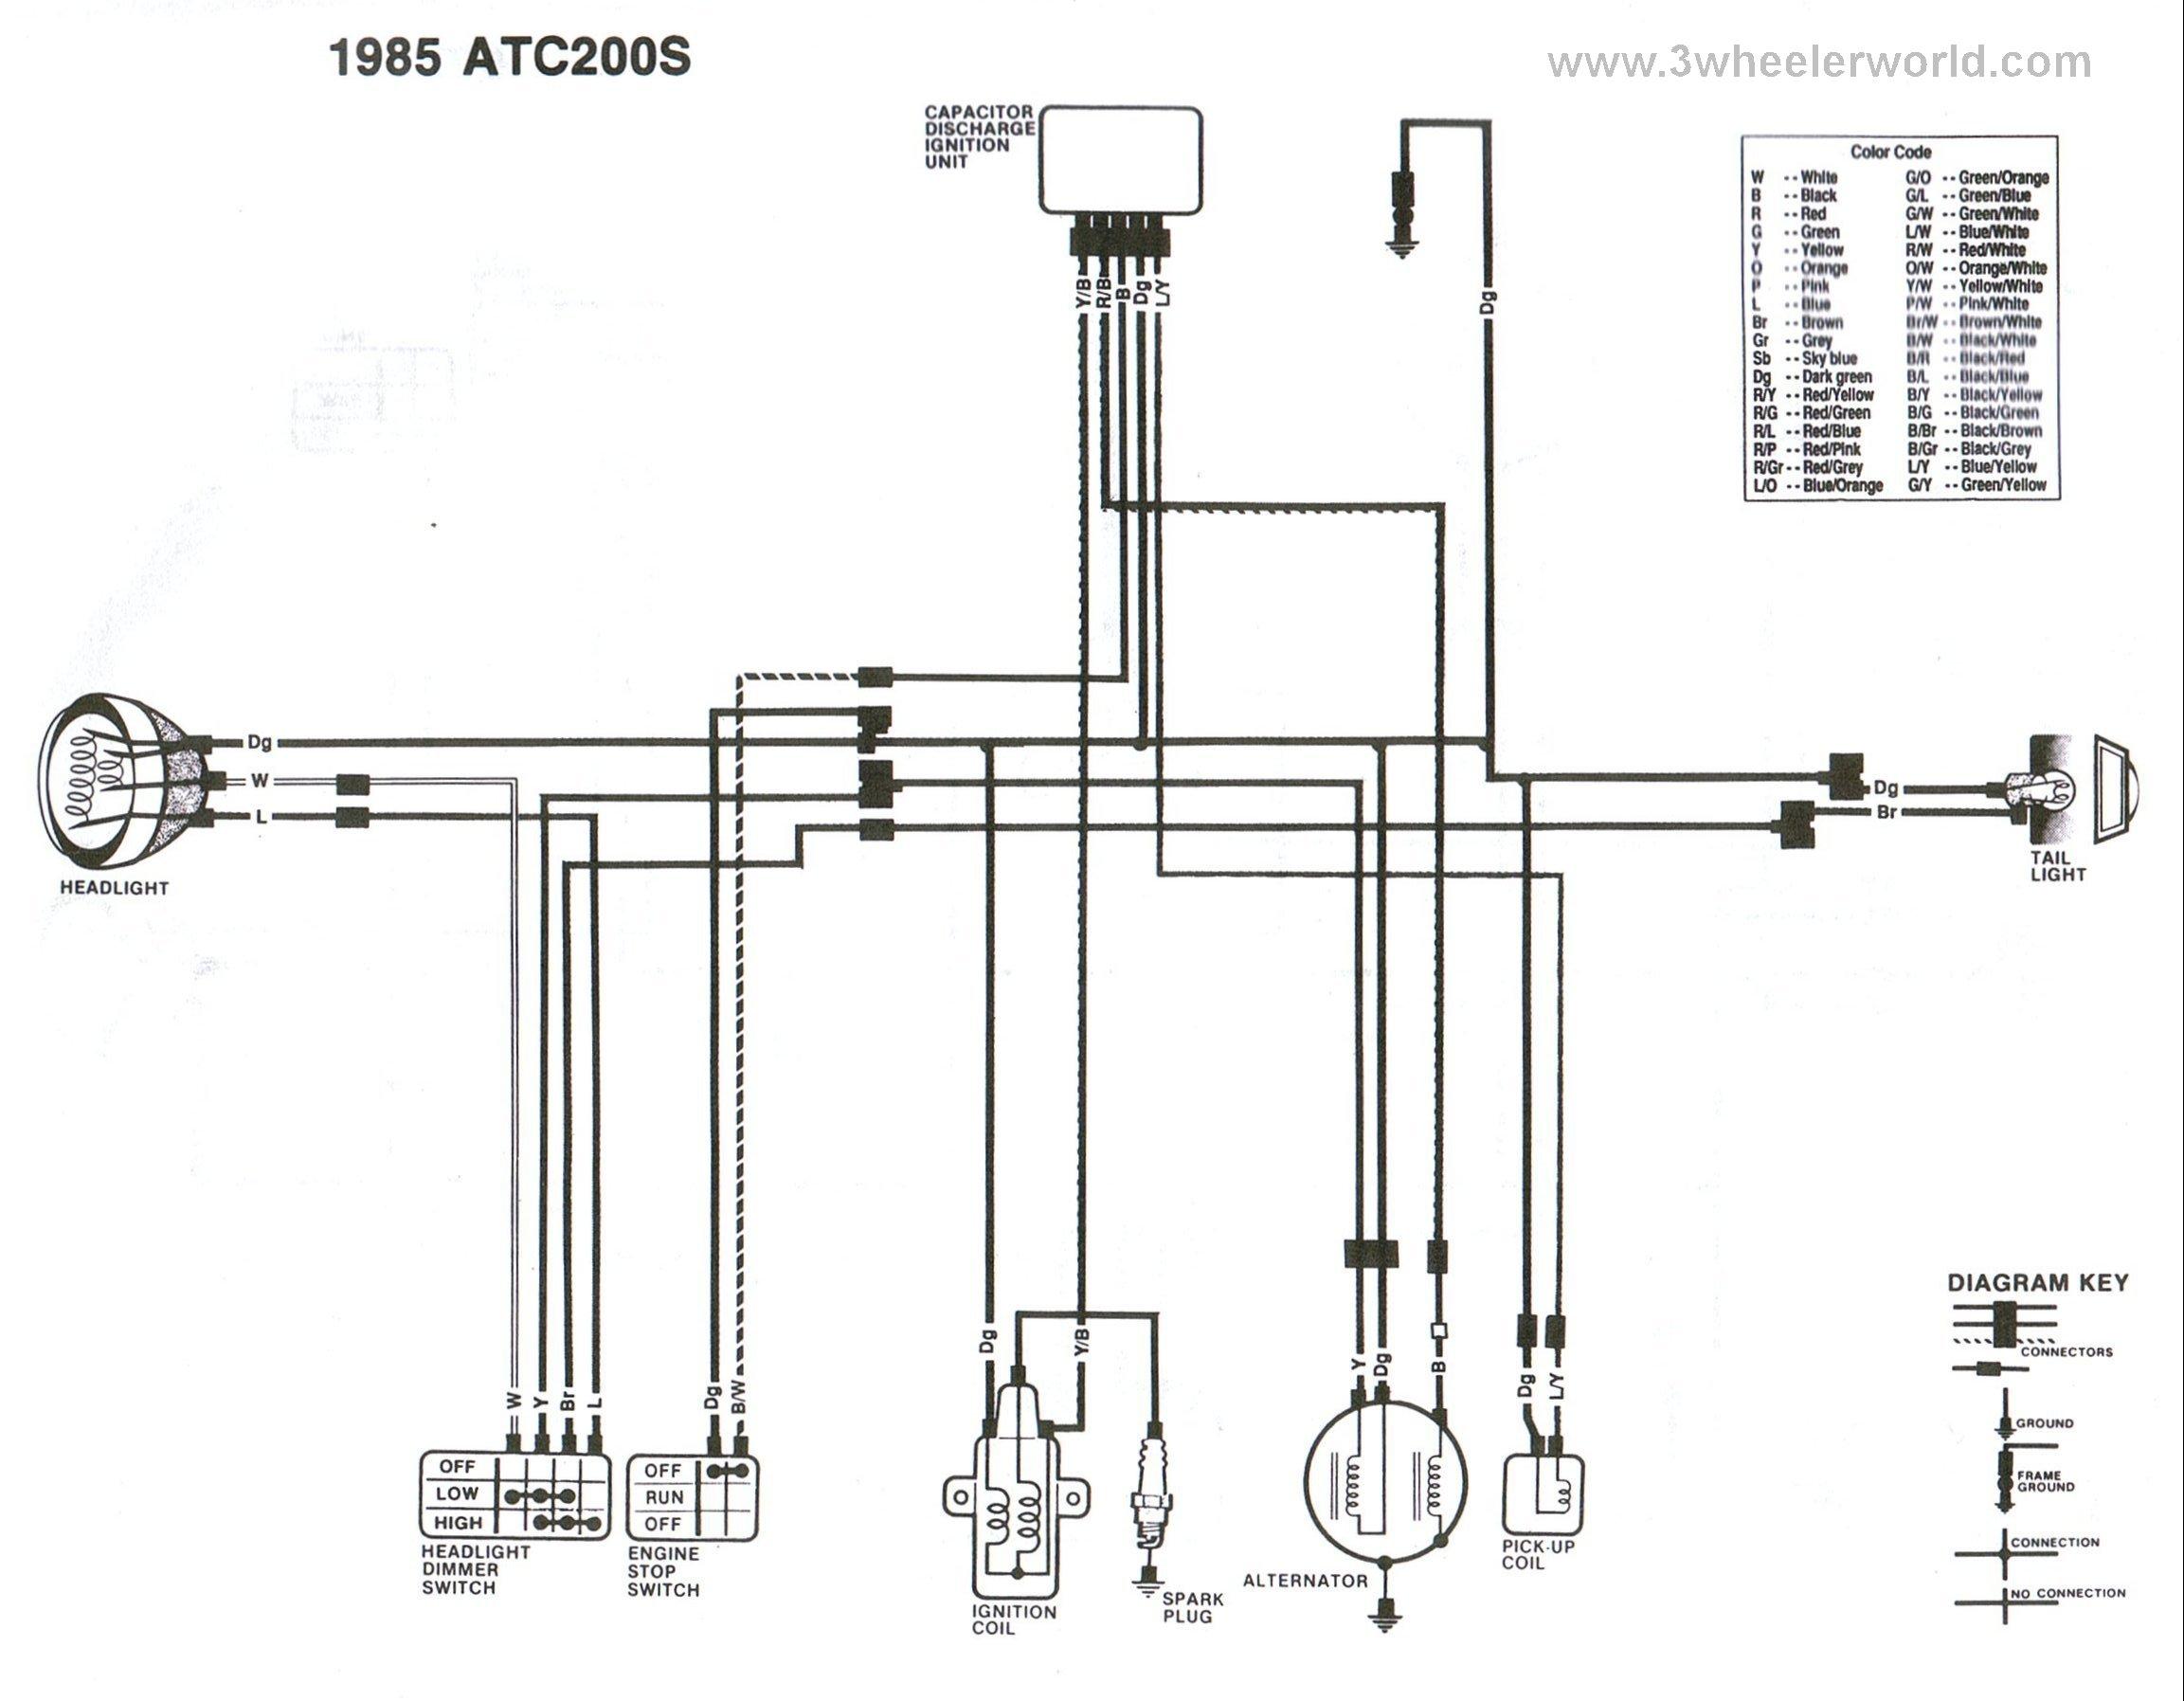 Wiring Diagram For Honda Xr400r - Wiring Diagram Schemas